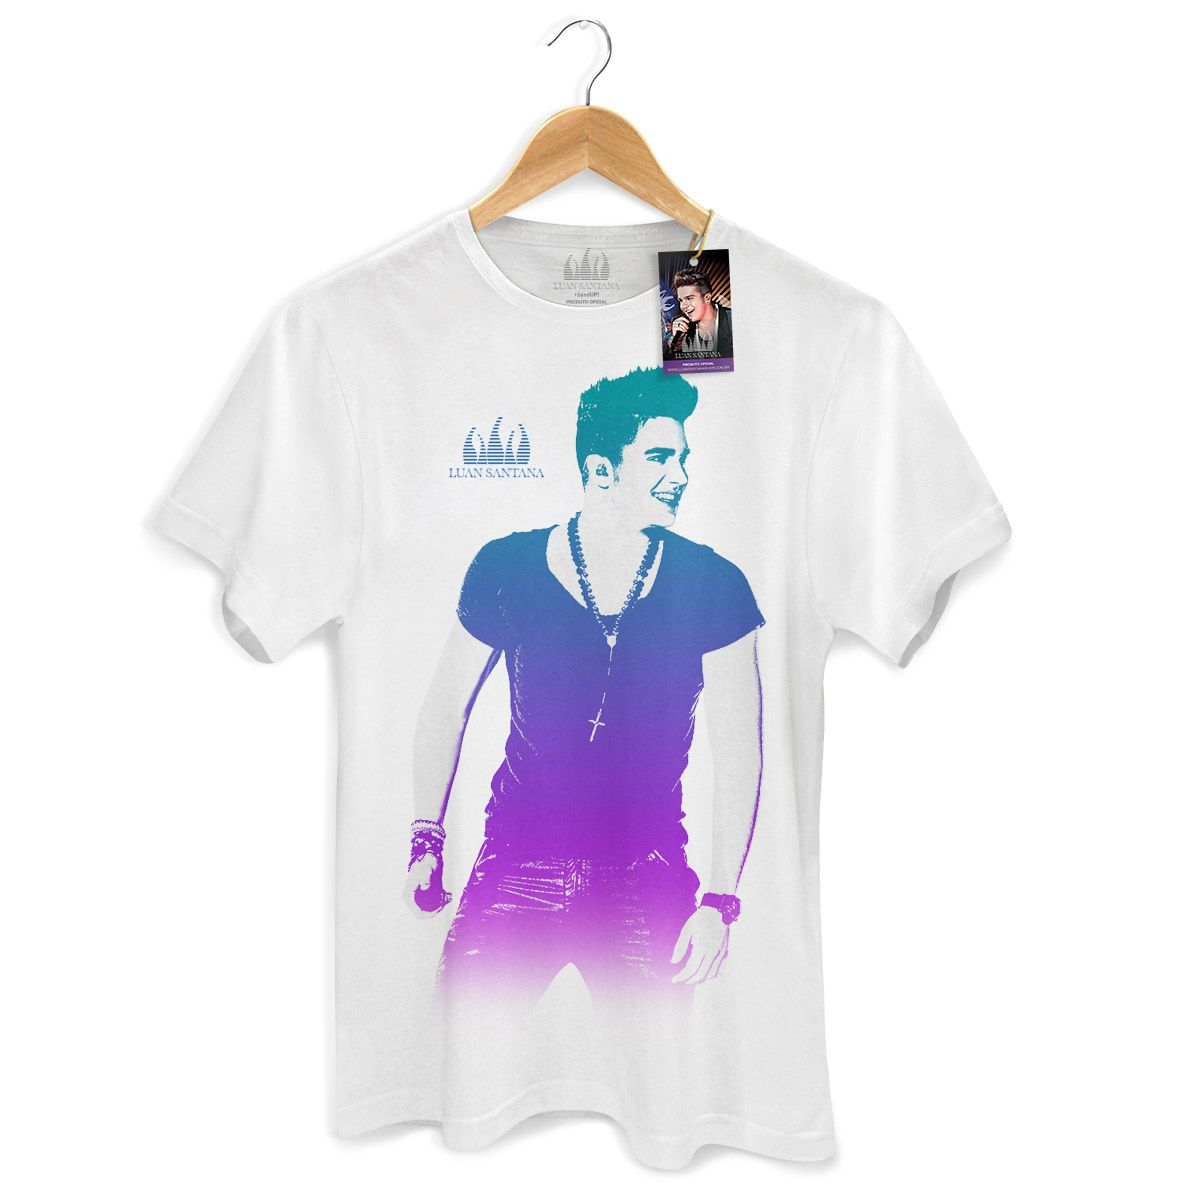 Camiseta Masculina Luan Santana - Foto Degradê Branca